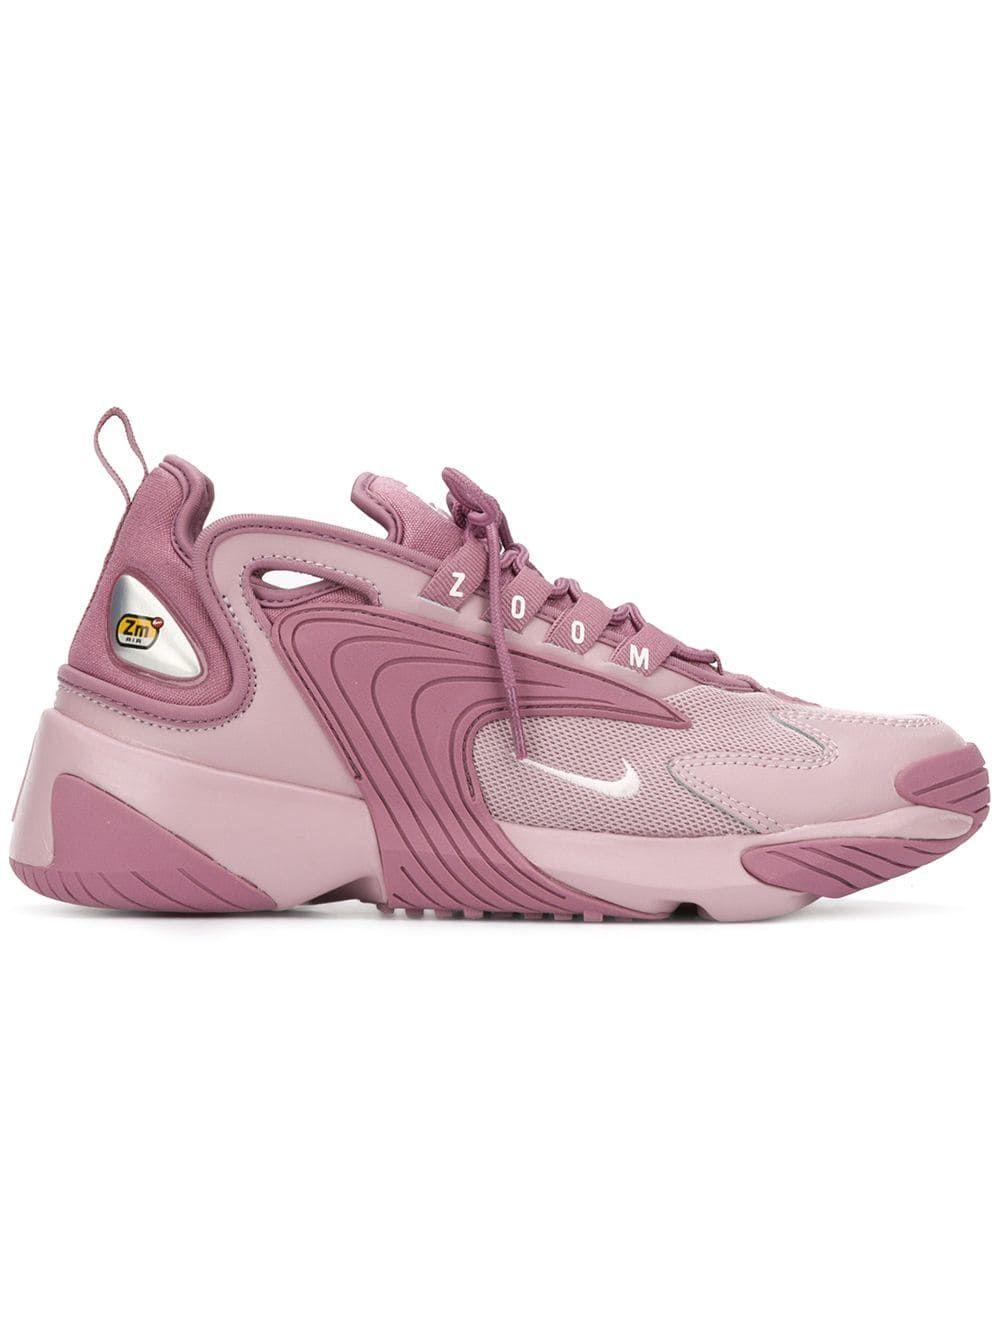 finest selection 3e38d fe093 NIKE WOMEN S ZOOM 2K CASUAL SHOES, PURPLE.  nike  shoes